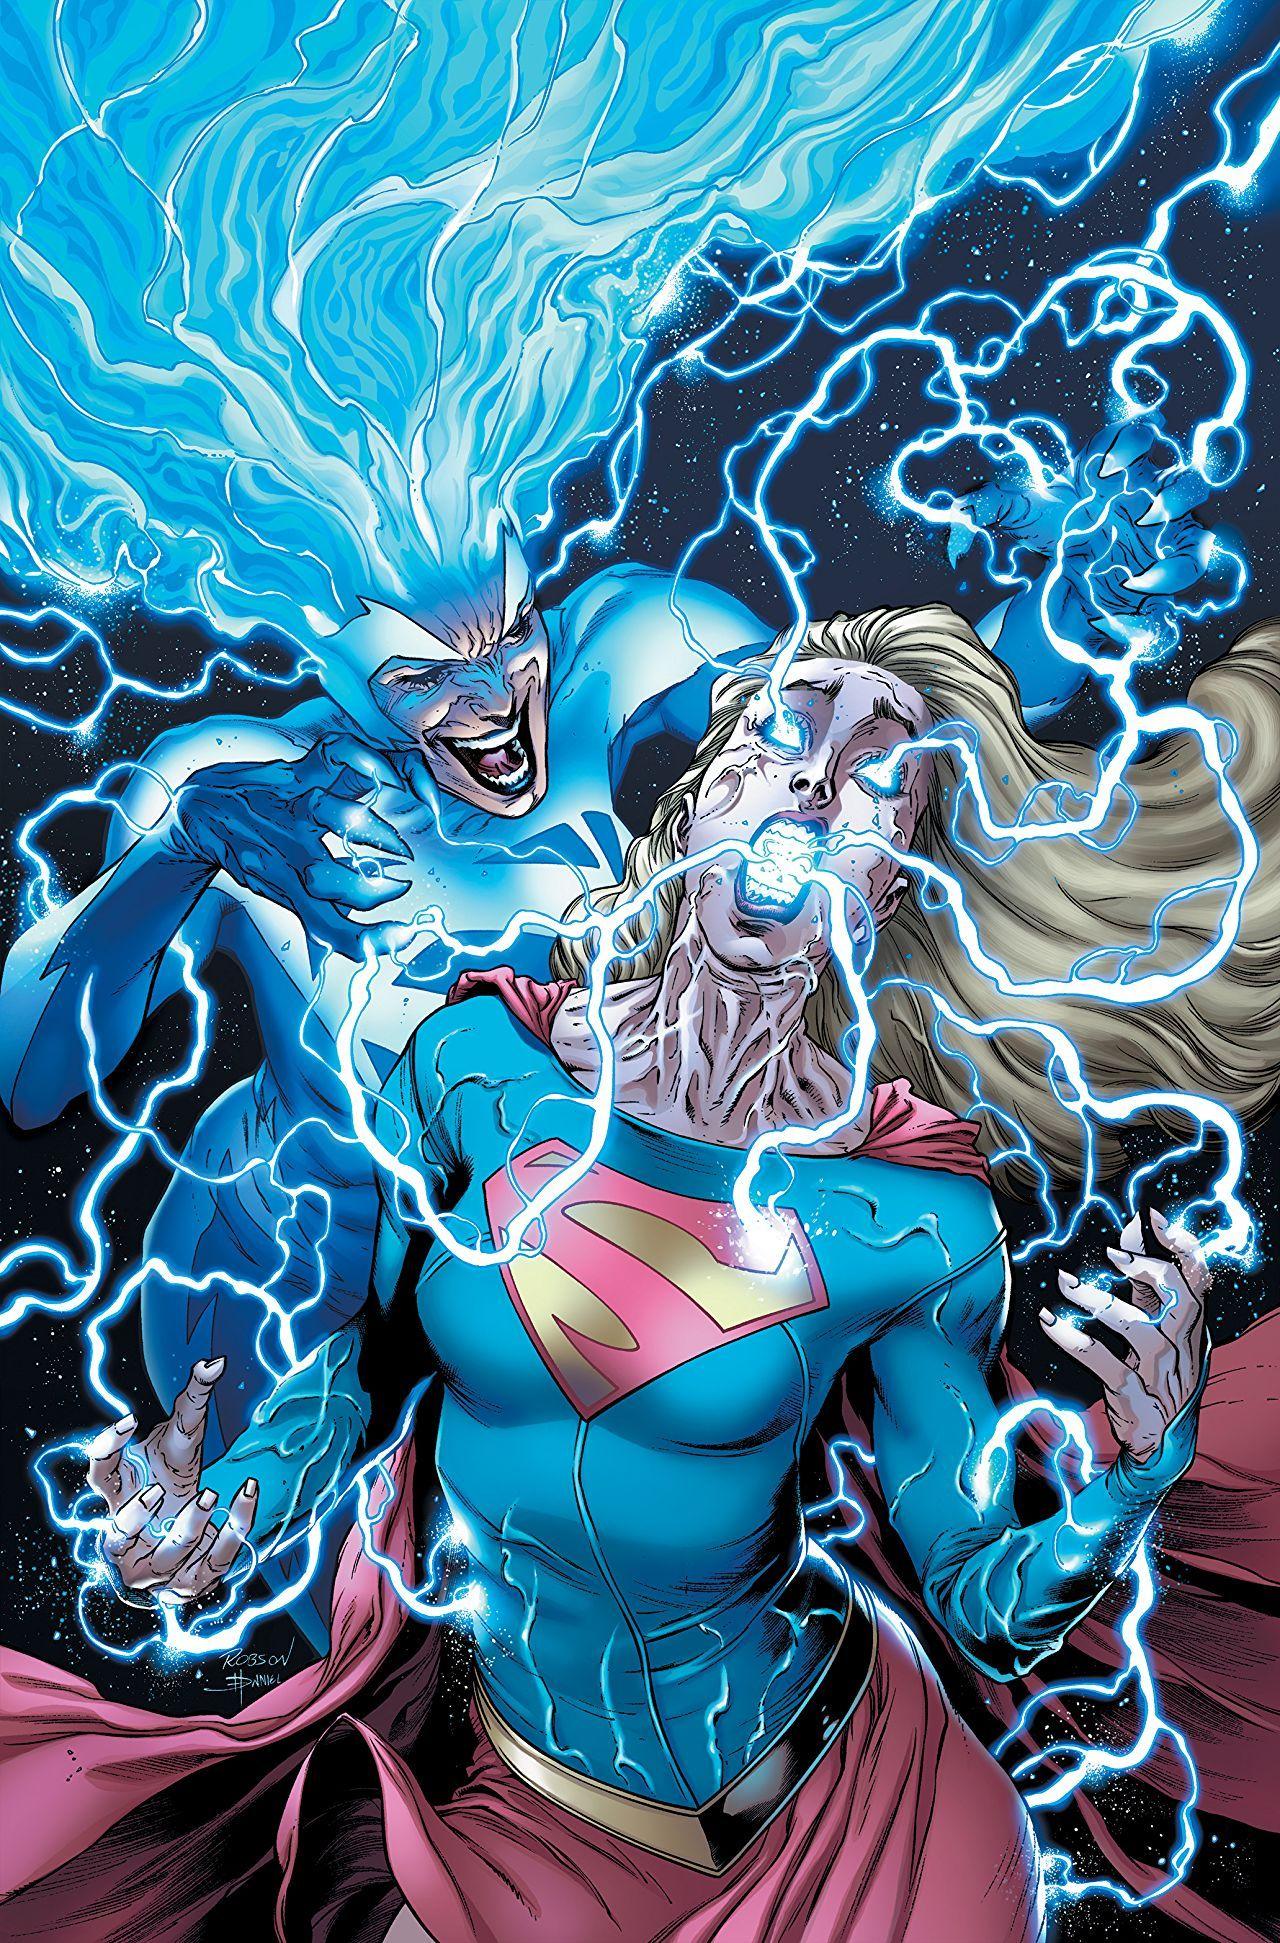 Supergirl Vol 7 16 Textless.jpg